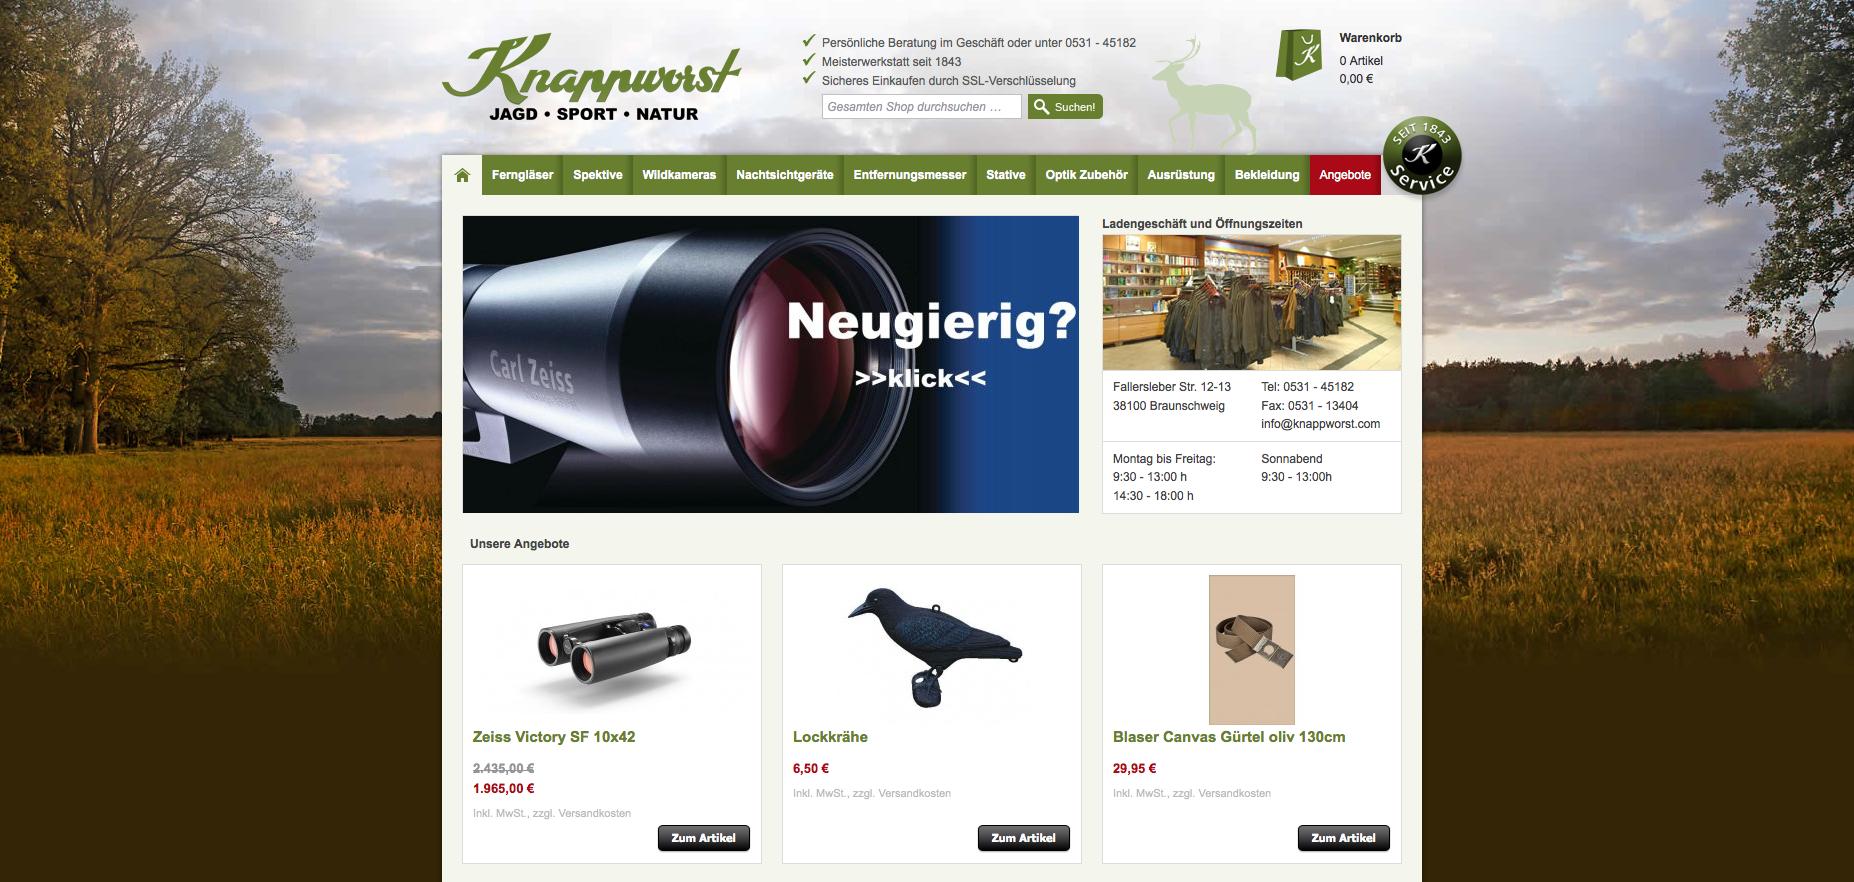 Knappworst.de Gutschein